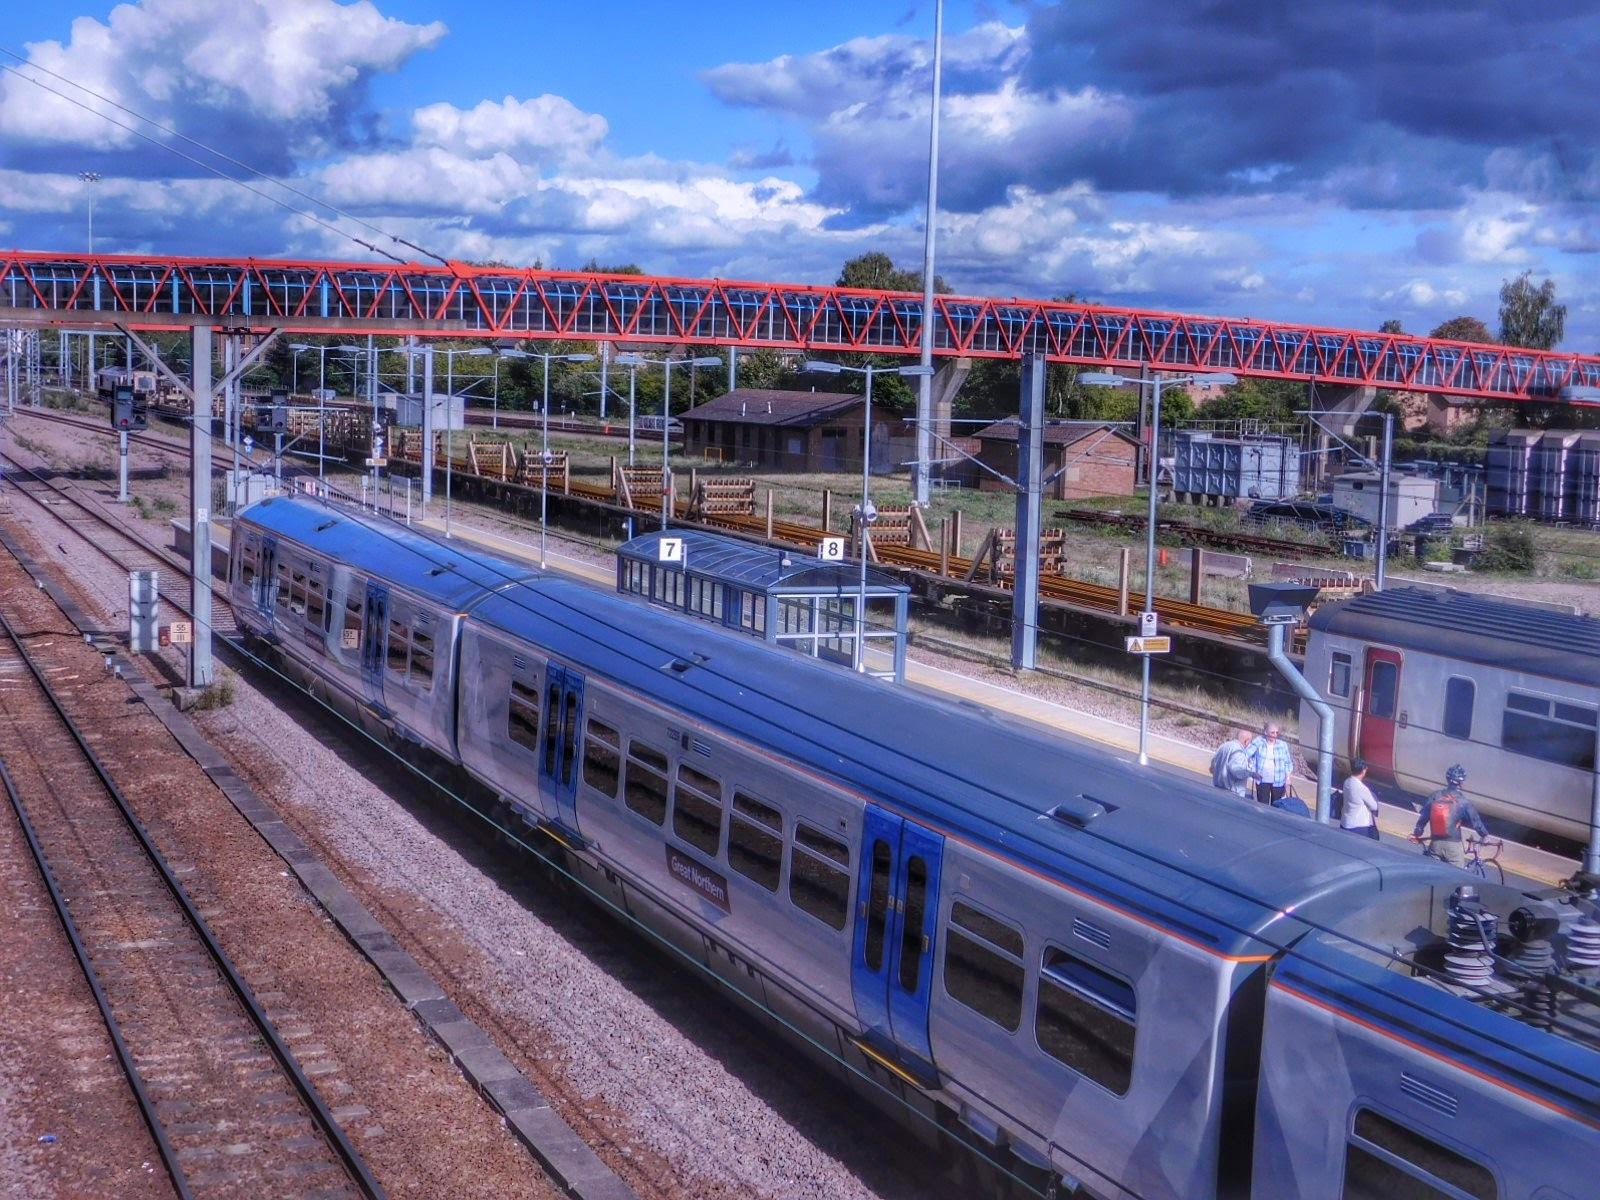 Cambridge Railway Station, UK by Sheila Button